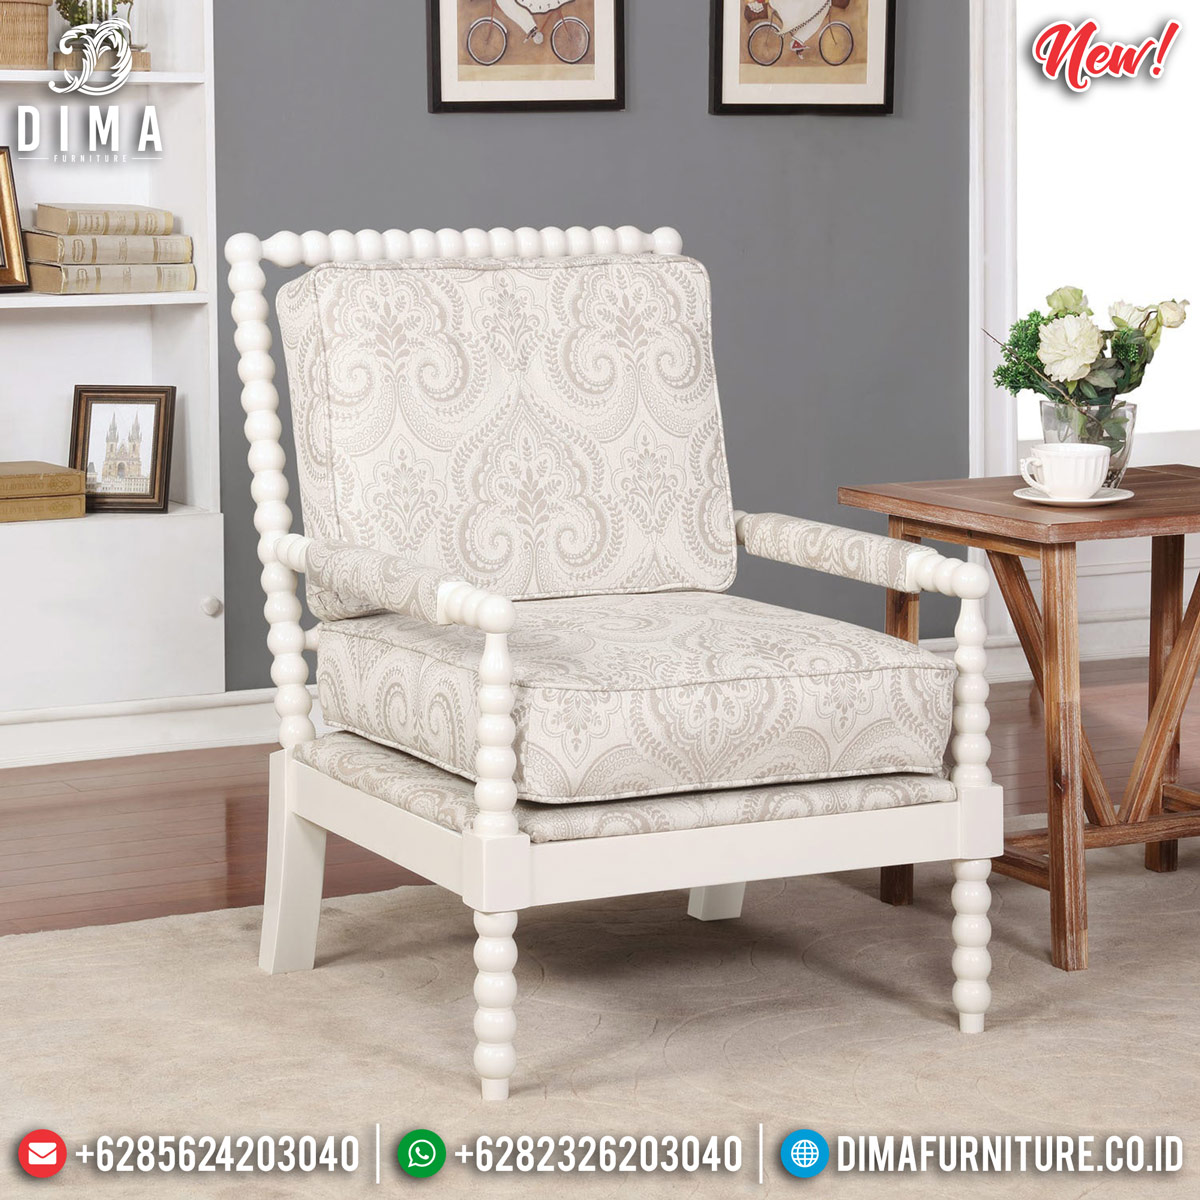 Sofa Tamu Minimalis Single Seater Furniture Jepara Terbaru TTJ-0897